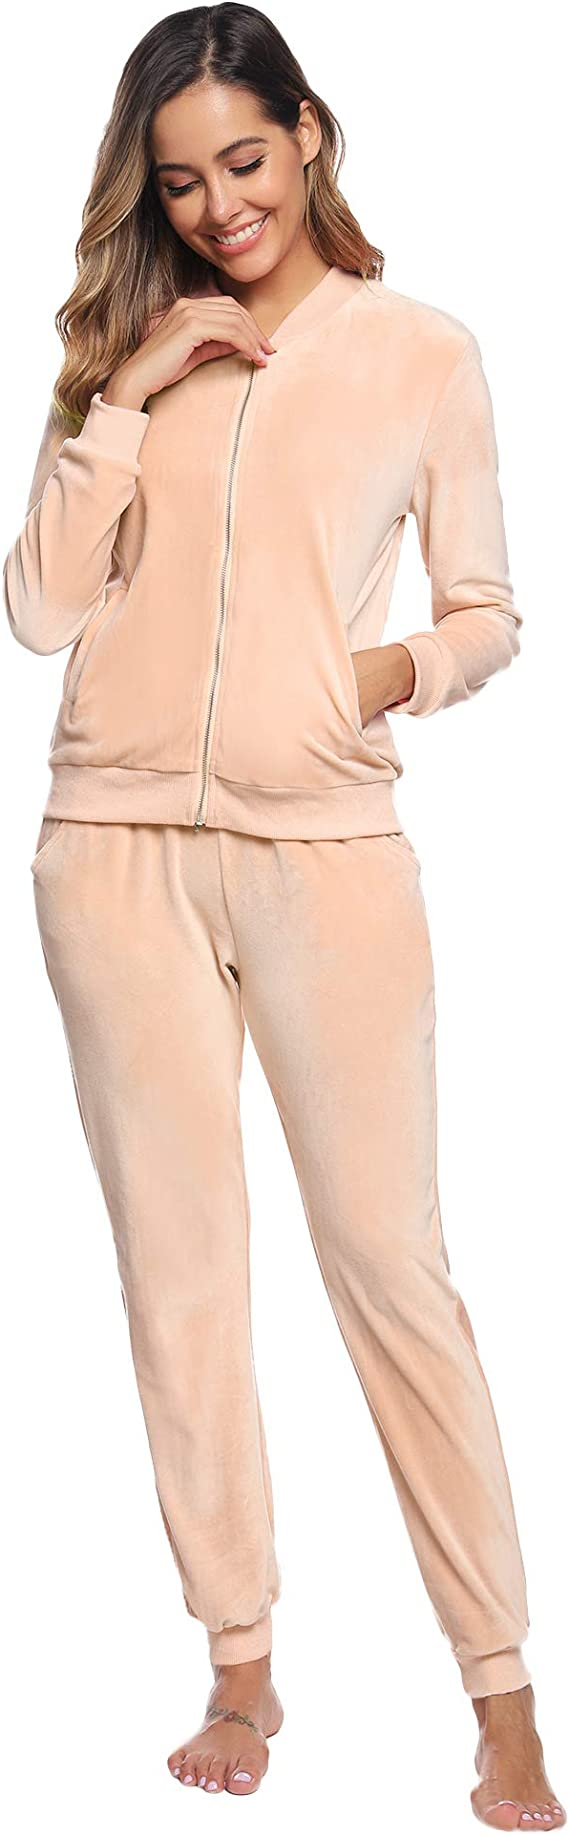 Women Tracksuit Long Sleeve  Zipper Sweatshirt Striped Pants Activewear Set Suit